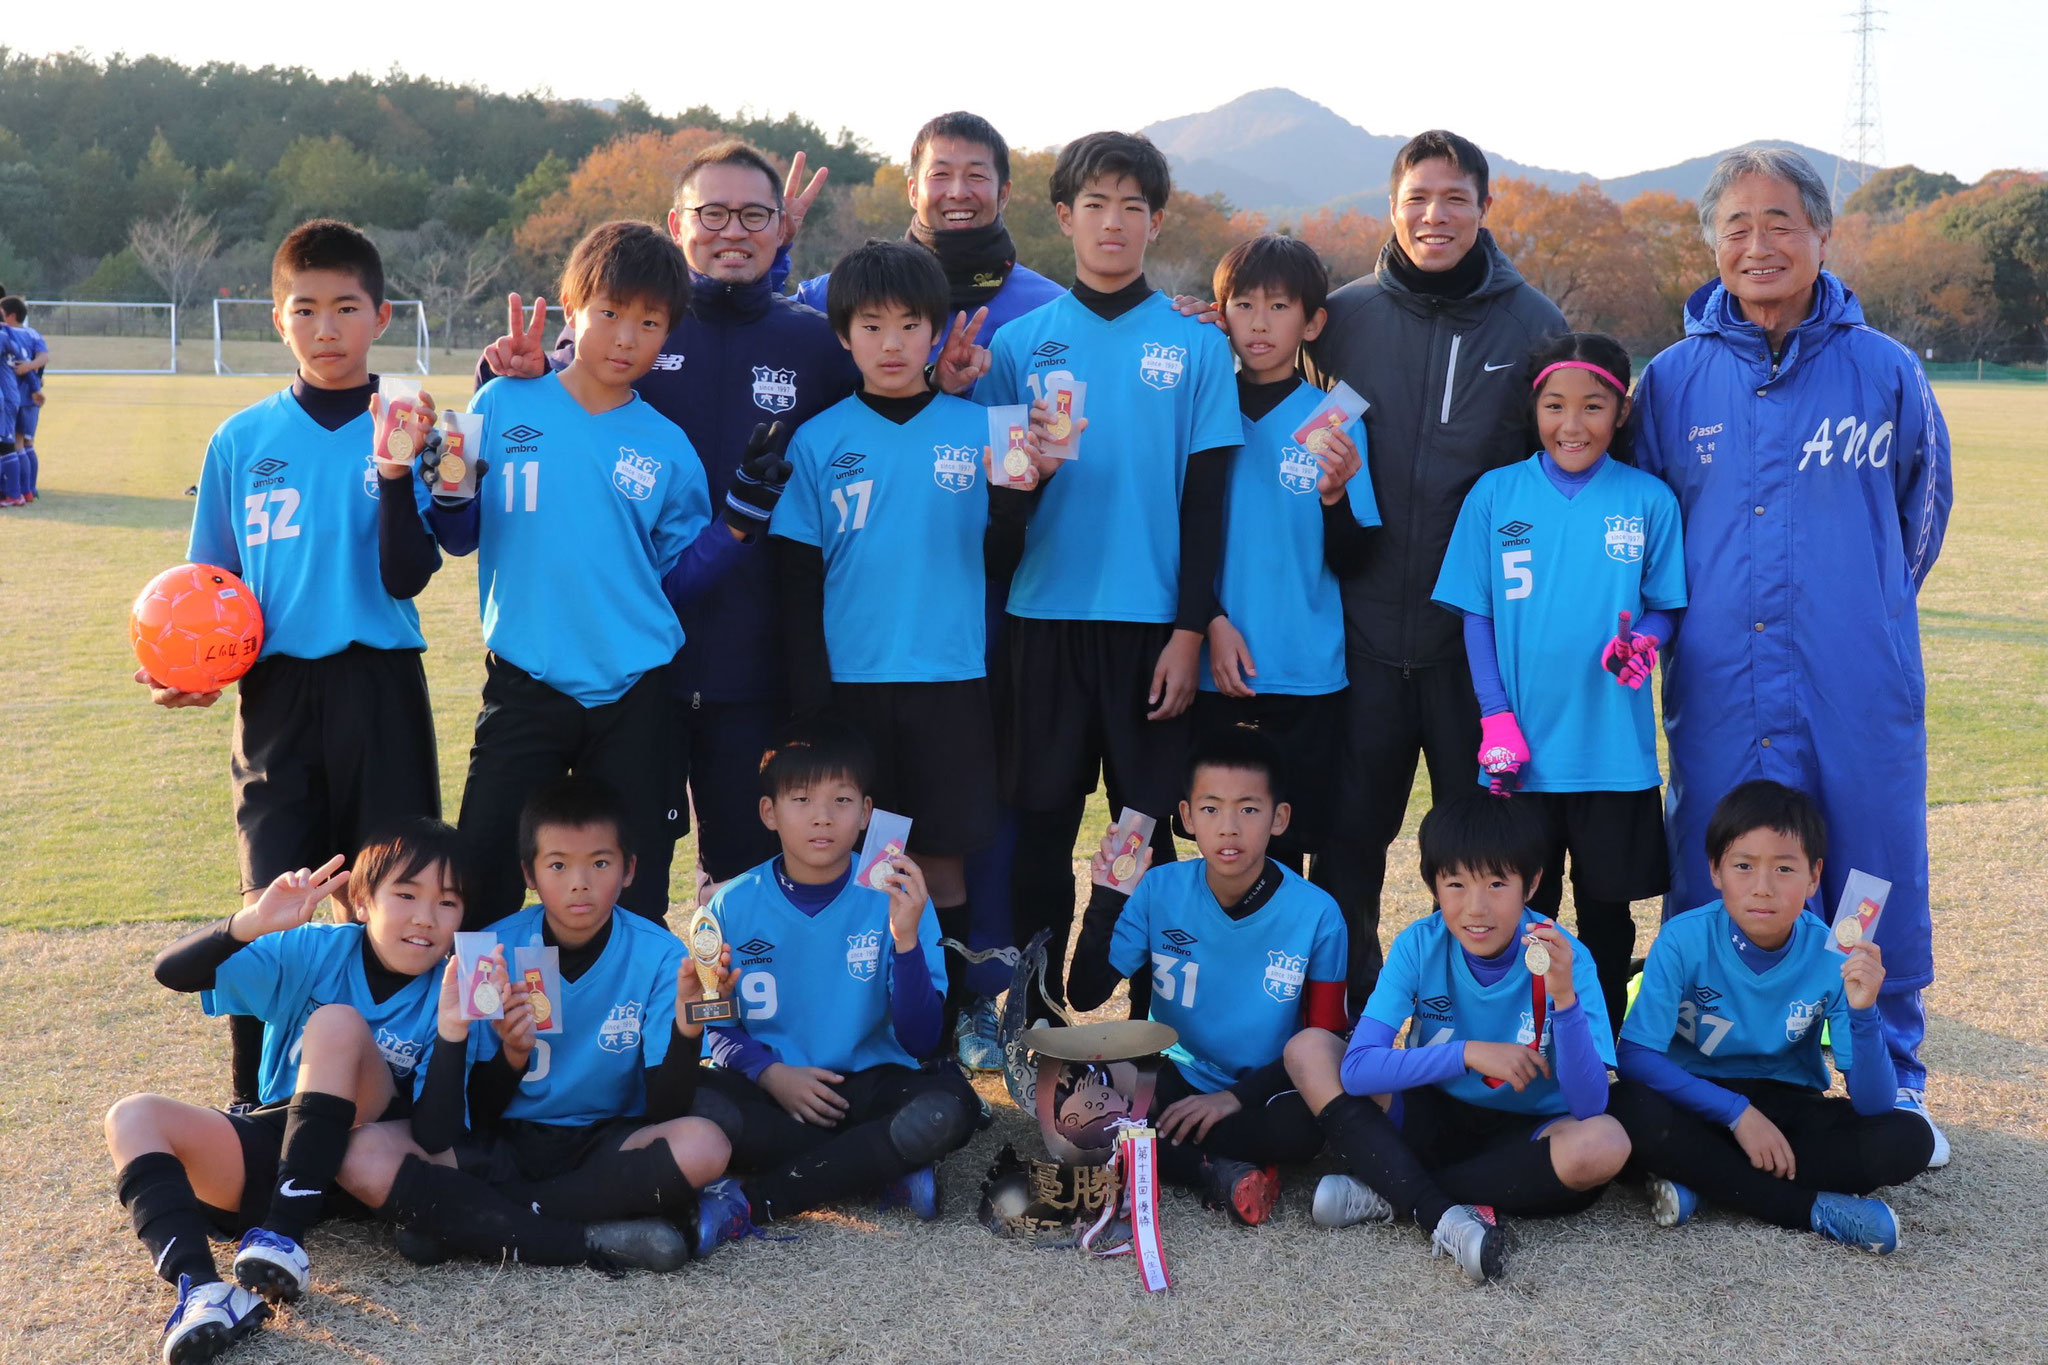 2019/12/8 U-12龍王カップ 優勝!!!